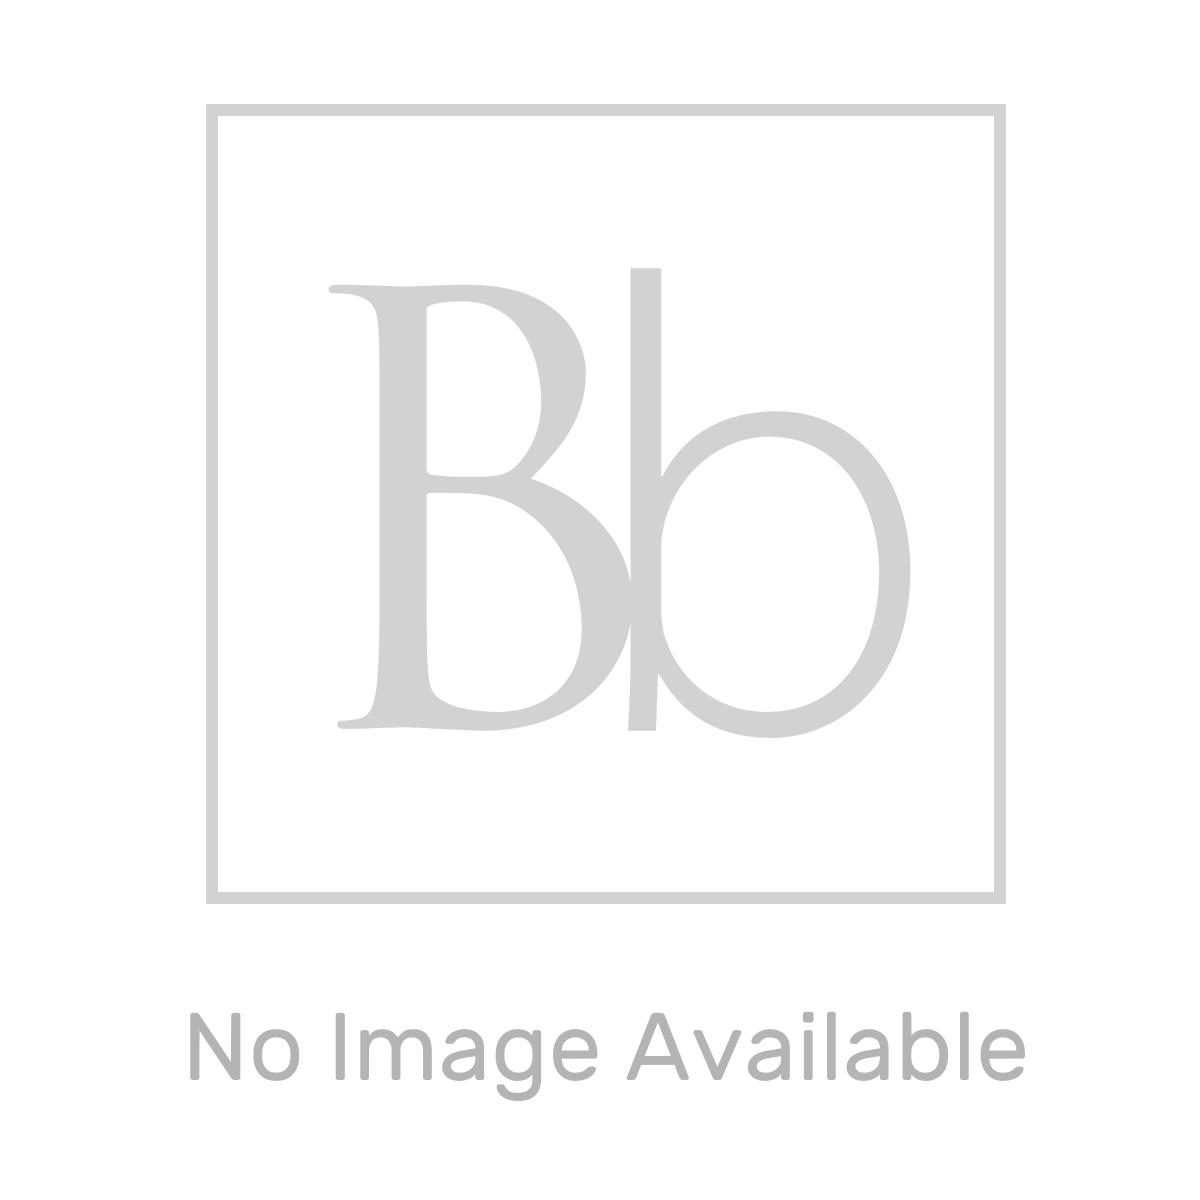 Homelux PVC Straight Edge 8mm White Tile Trim 2.5m